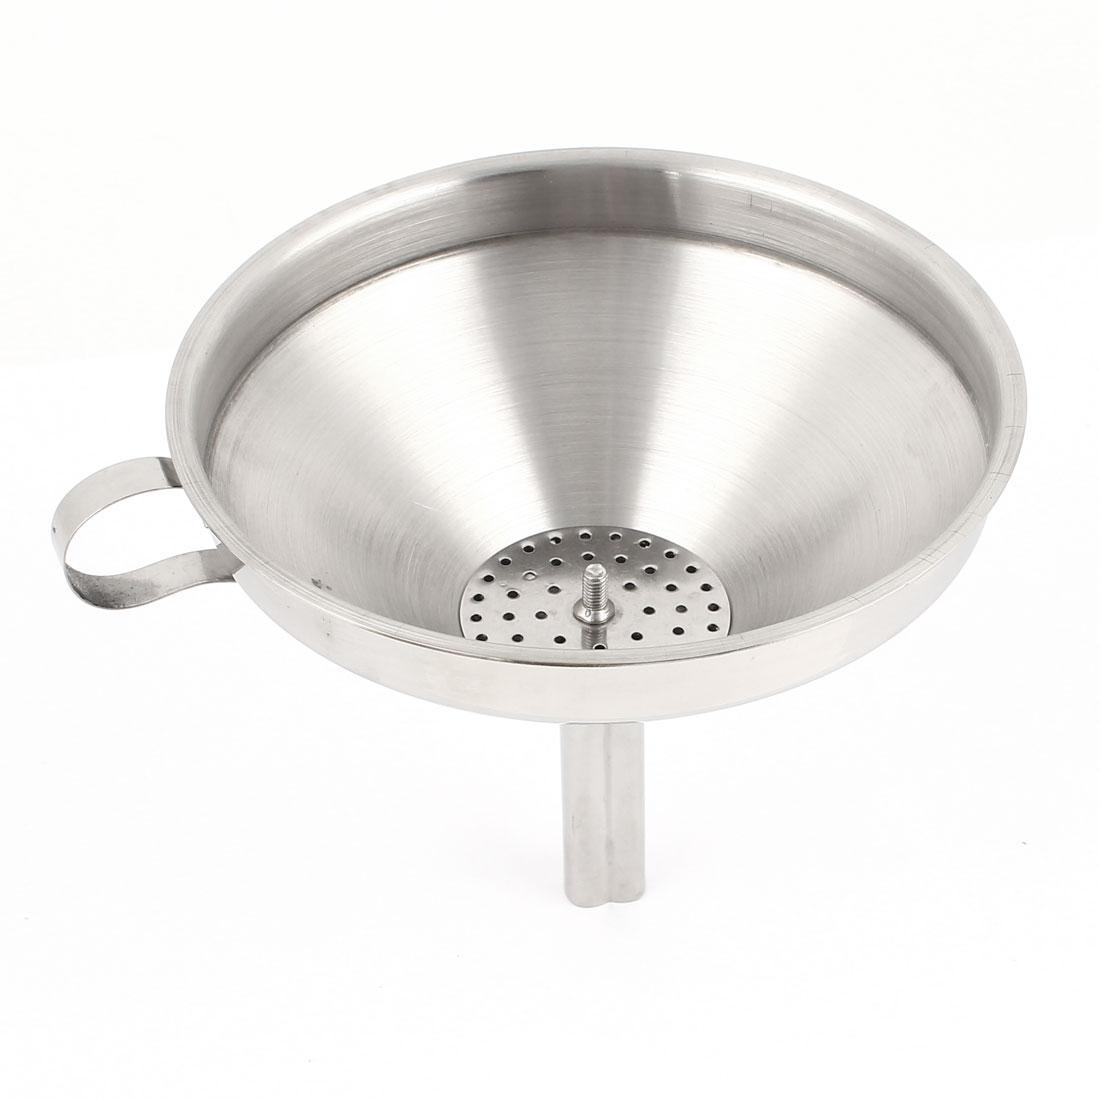 "6"" Dia Laboratory Liquid Measure Stainless Steel Filter Funnel"